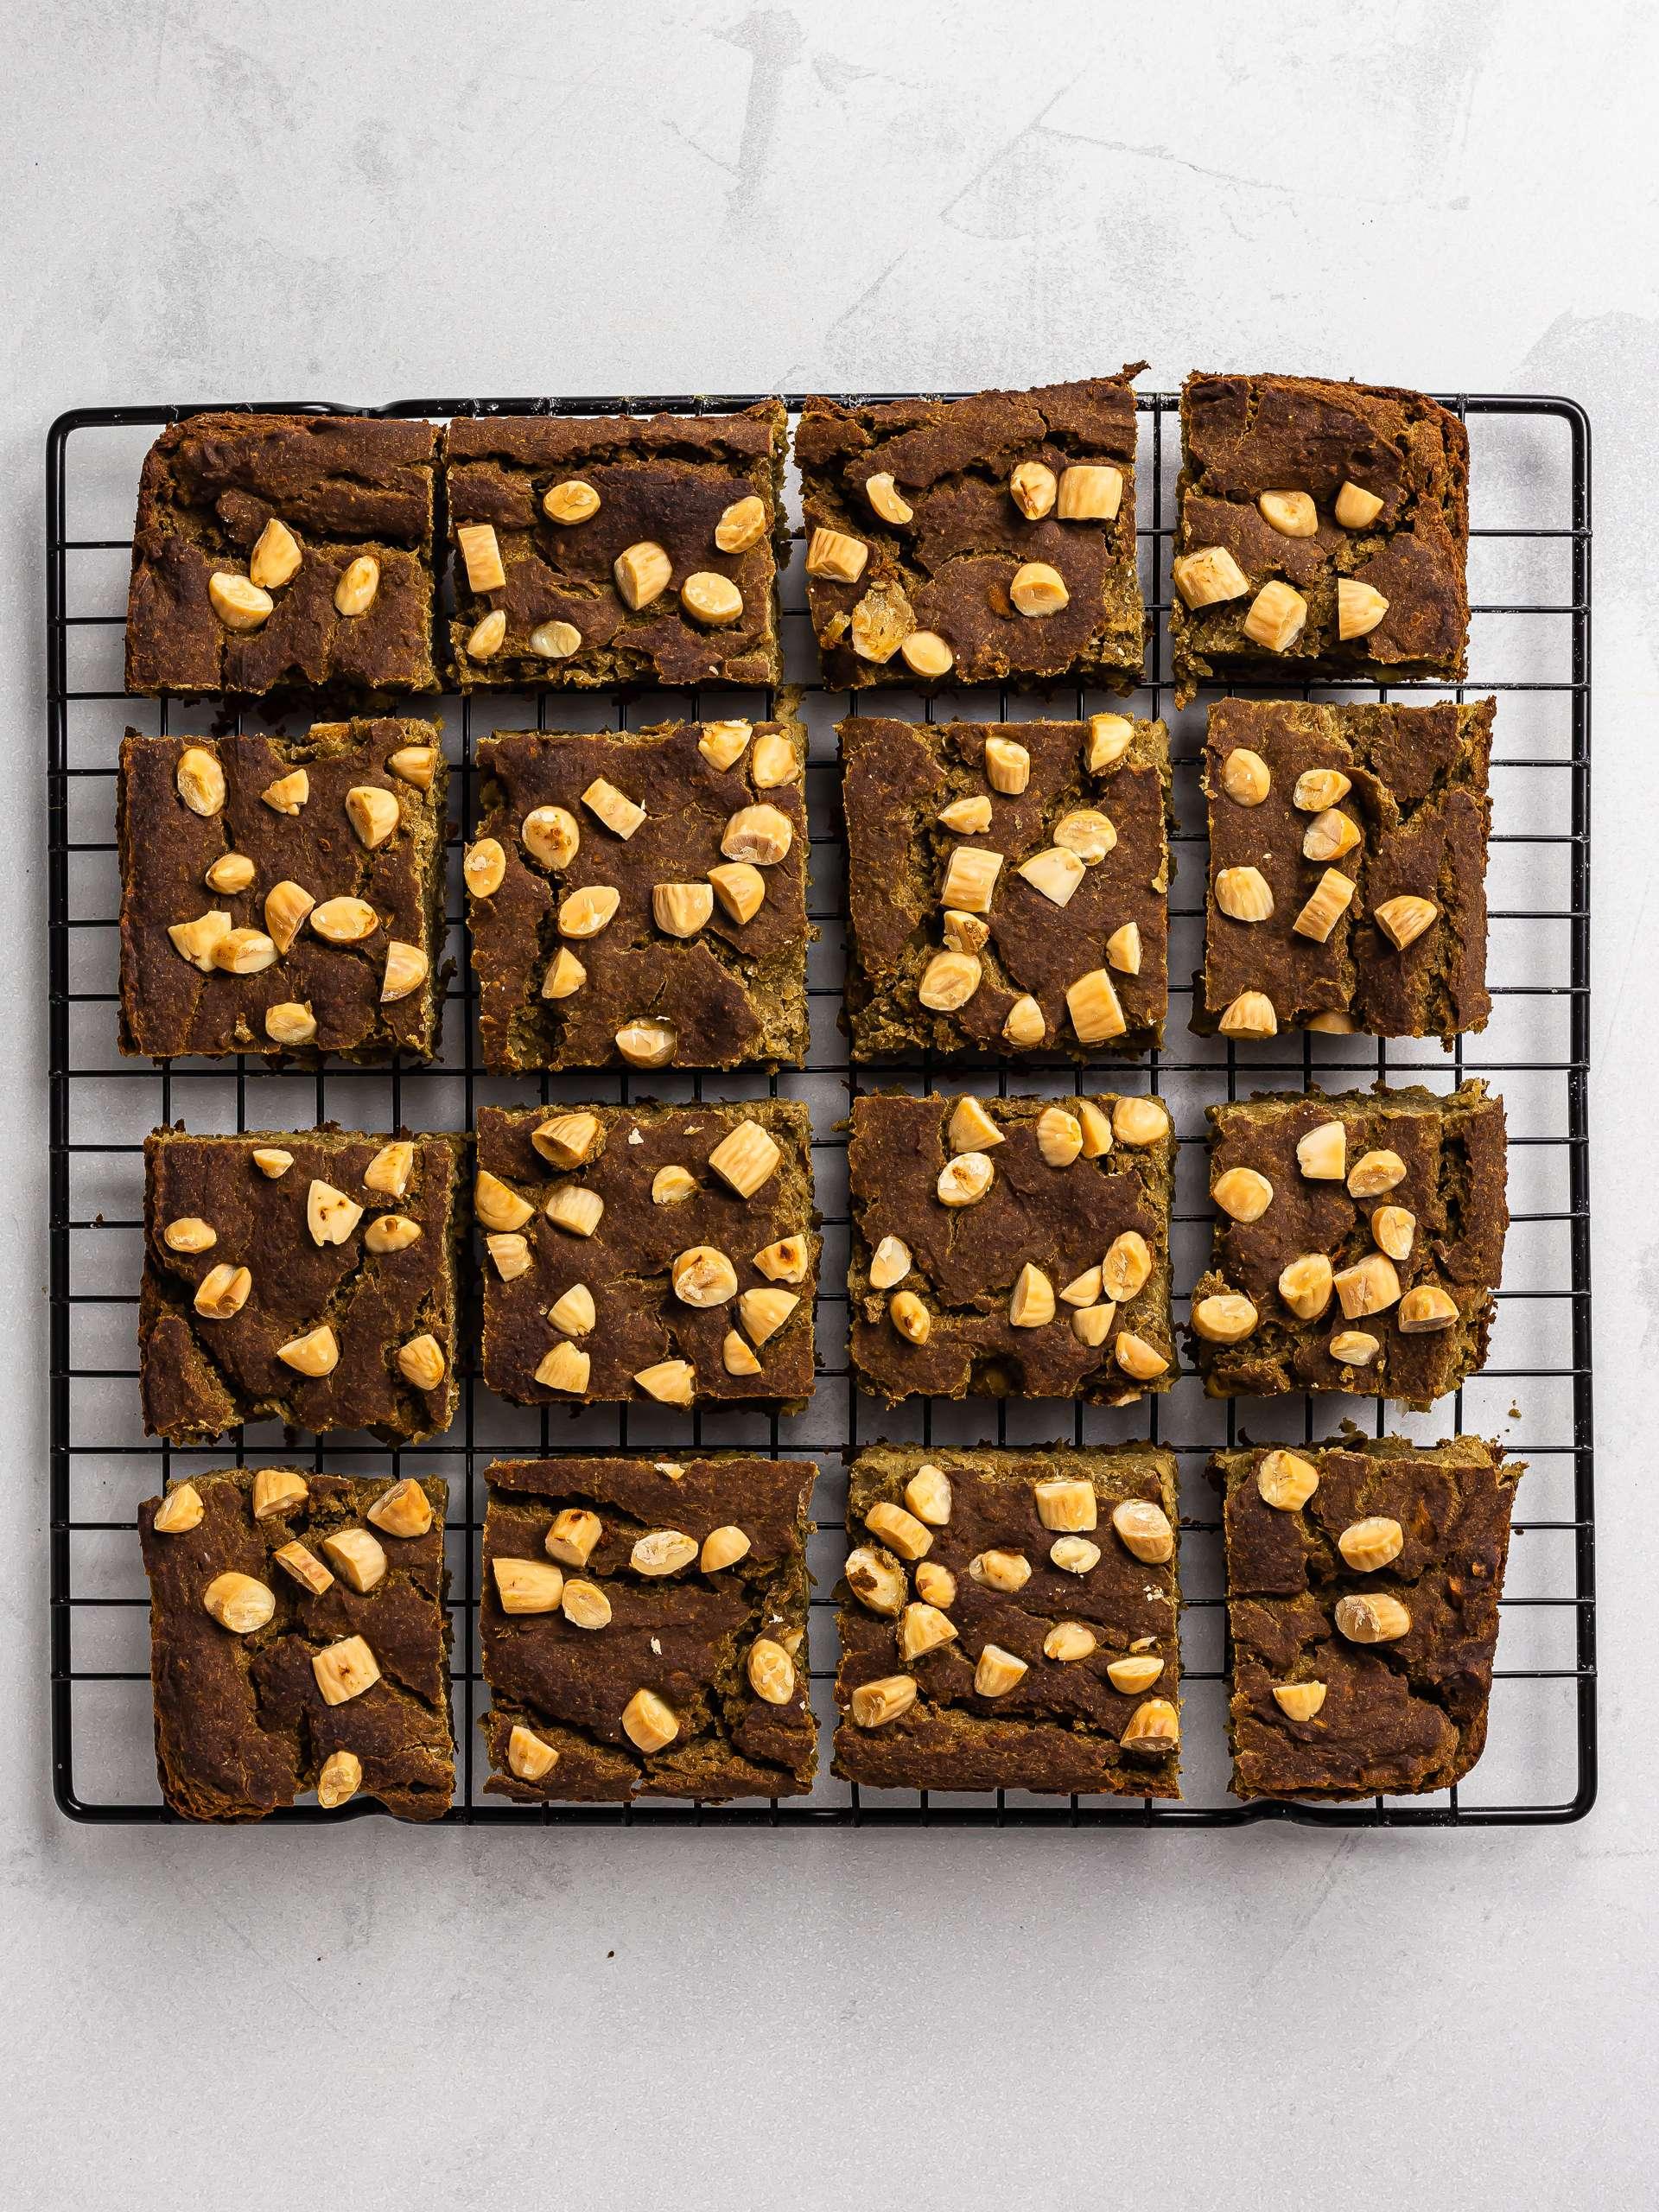 baked matcha brownies on a rack